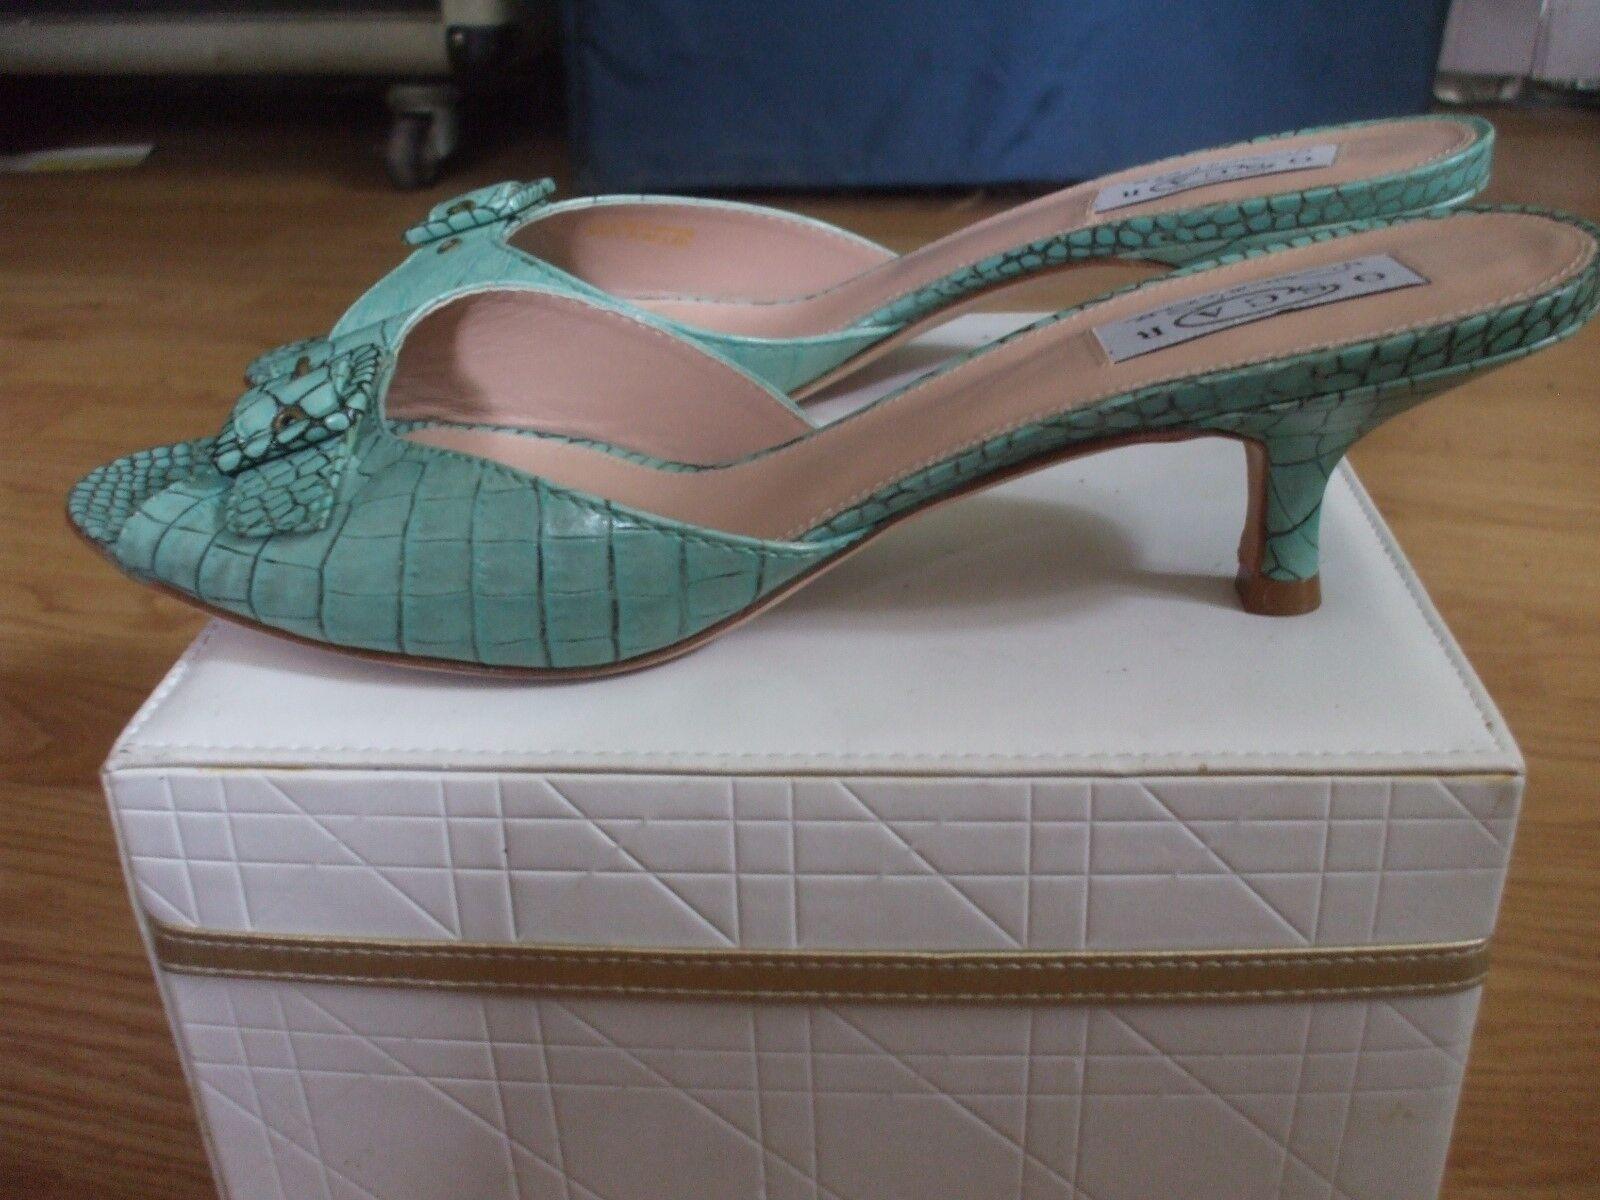 Oscar by Oscar De La Renta turquoise leather textured buckle kitten heel sandals